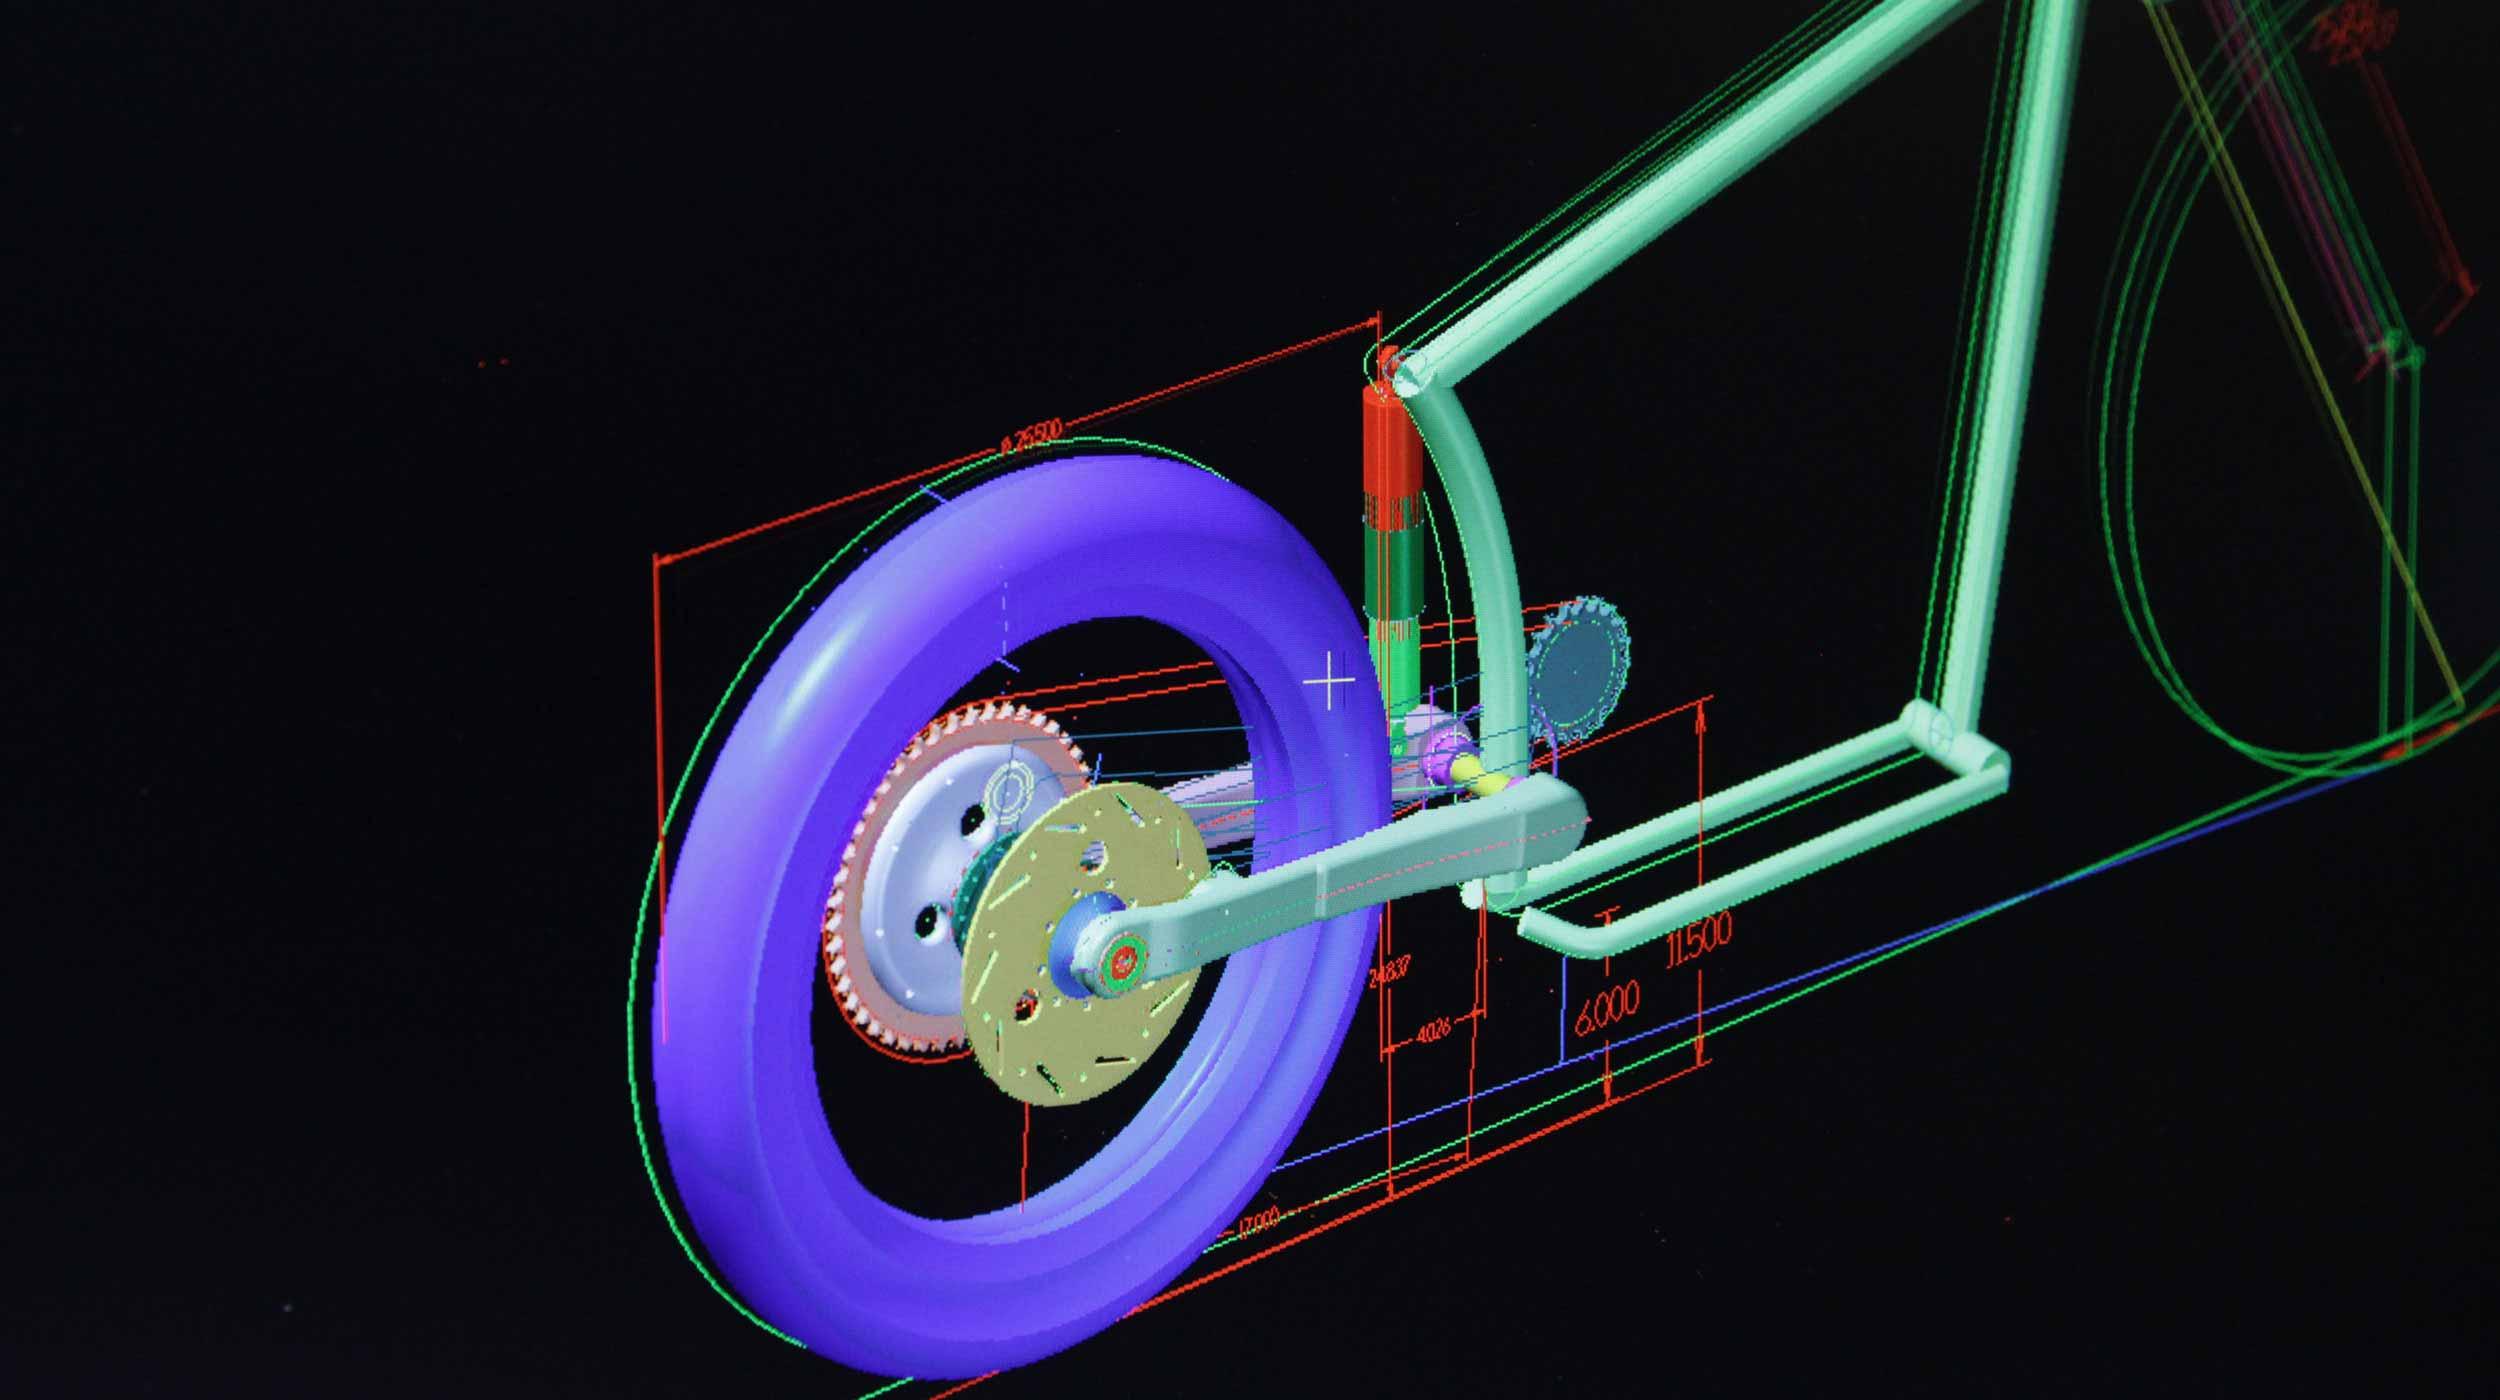 White-Rear-Suspension-Study.jpg